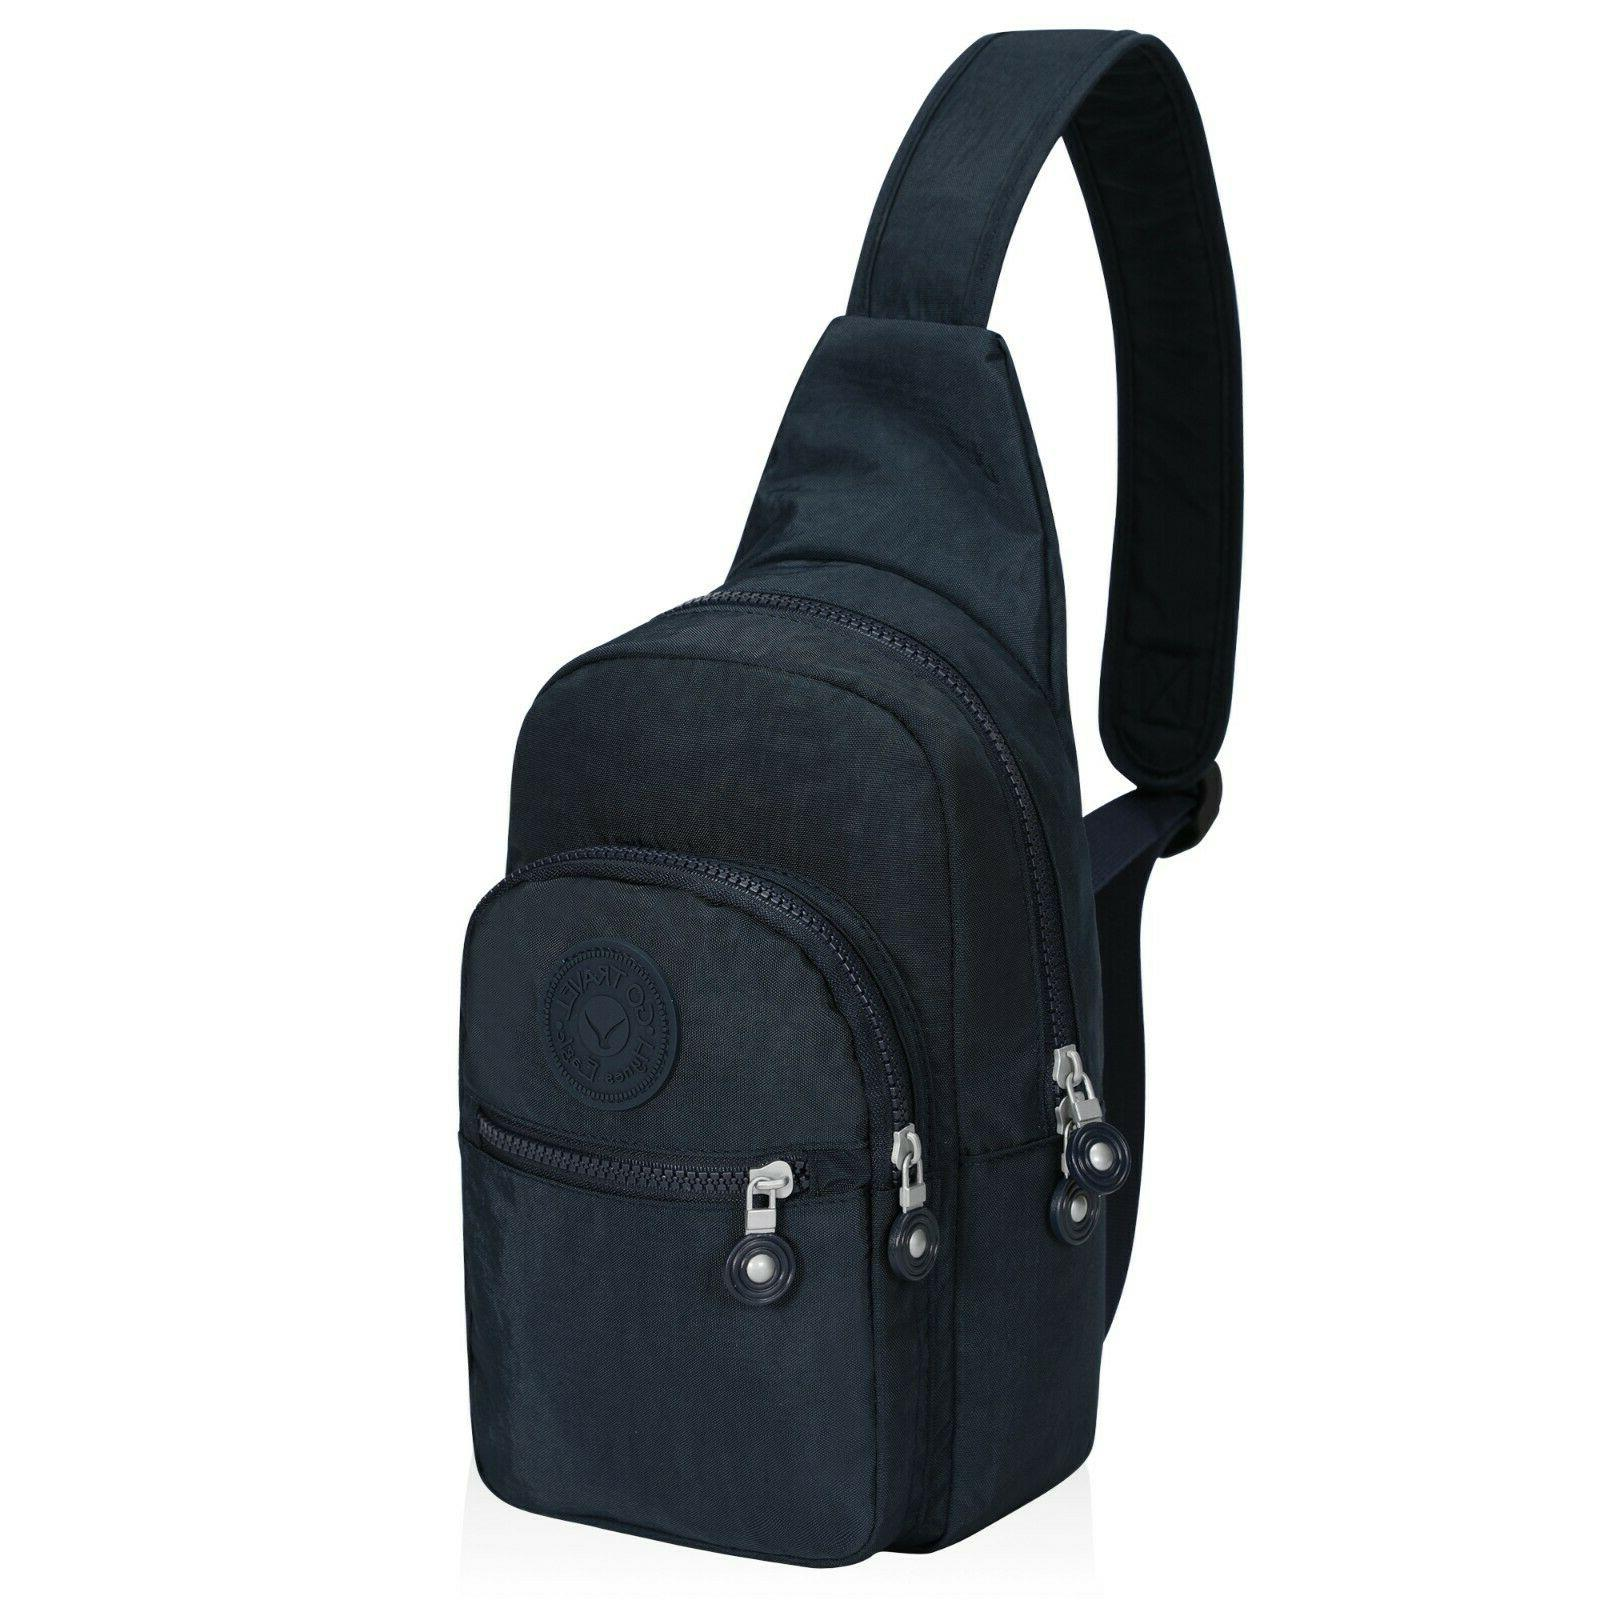 sling bag multipurpose crossbody backpack chest shoulder